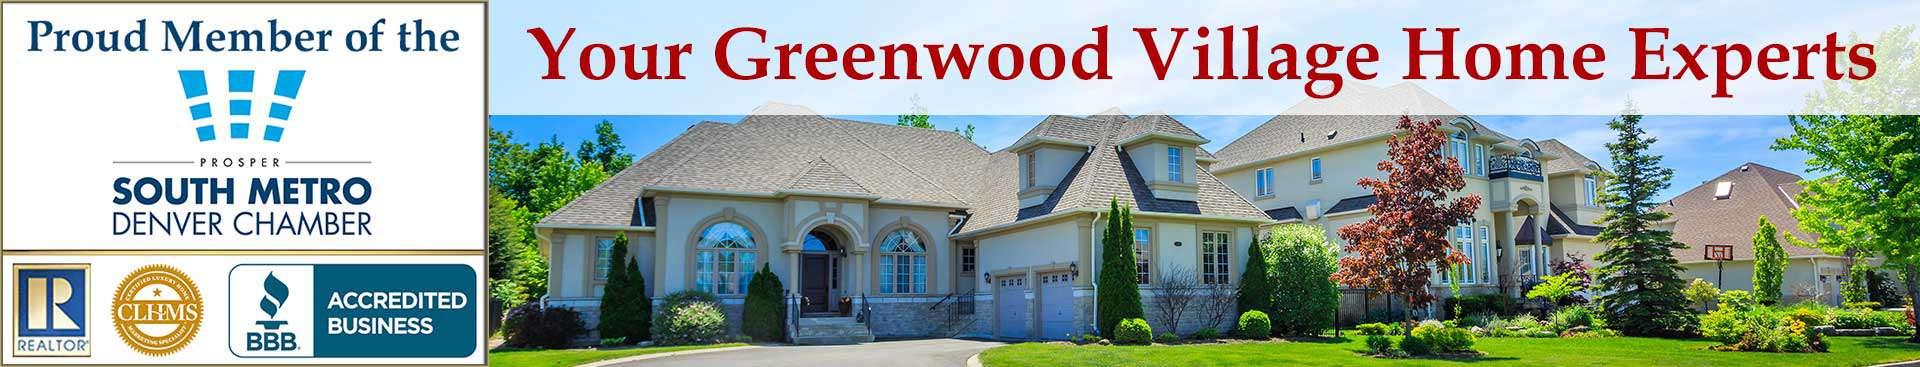 Greenwood Village CO Organizational Banner